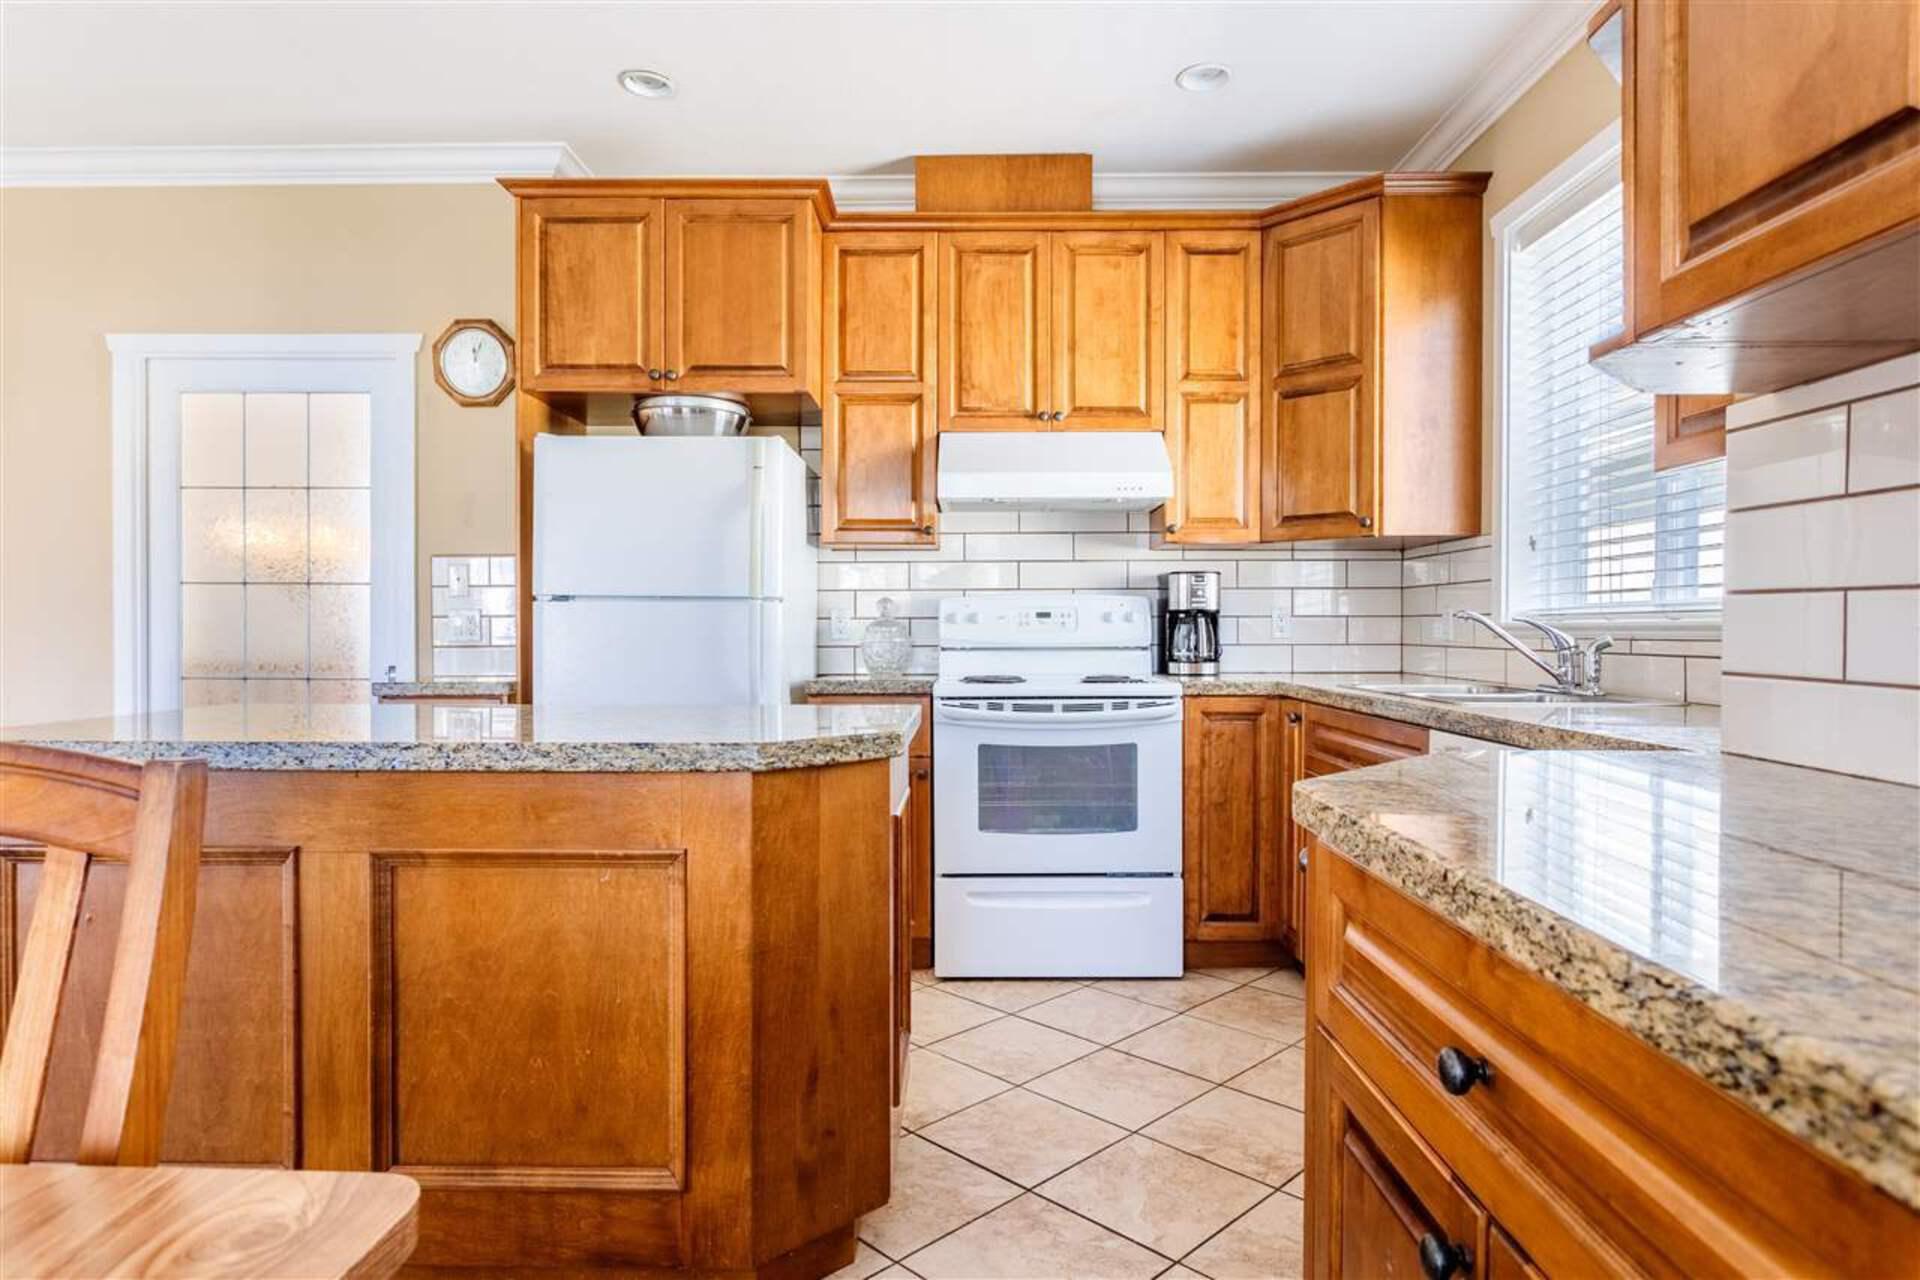 4015-frances-street-willingdon-heights-burnaby-north-07 at 4015 Frances Street, Willingdon Heights, Burnaby North